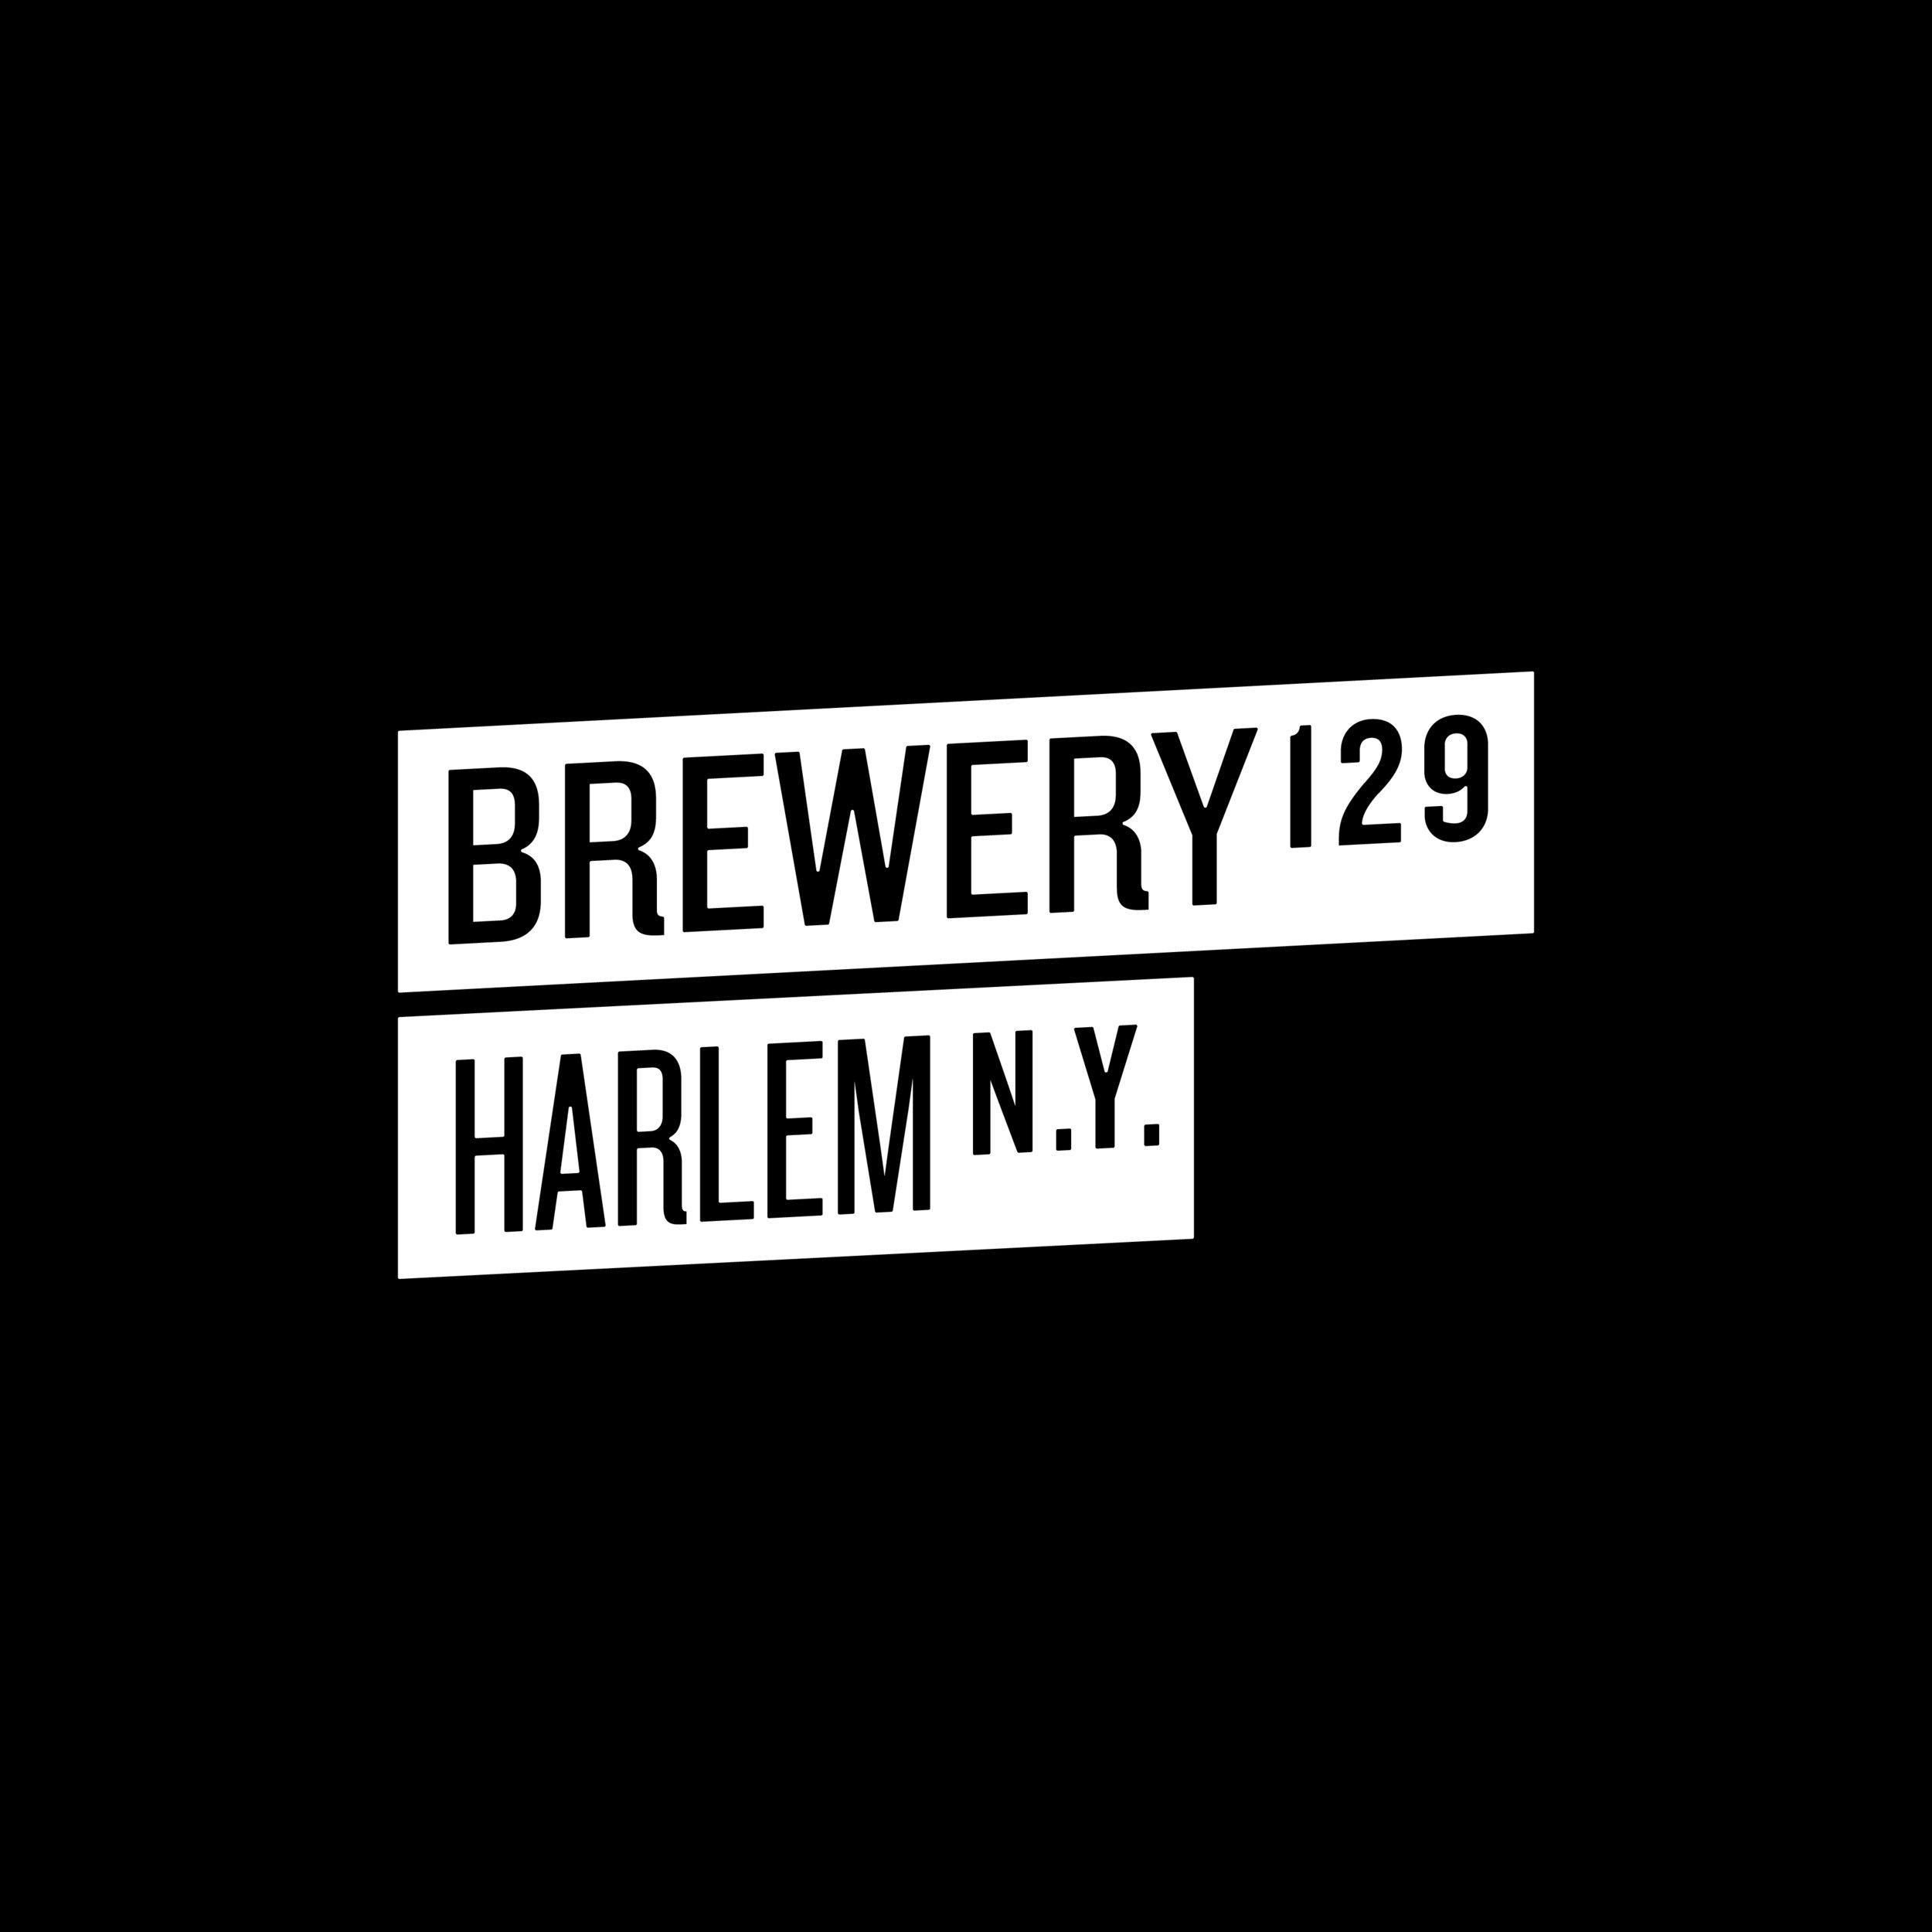 Brewery129 Logos-06.jpg